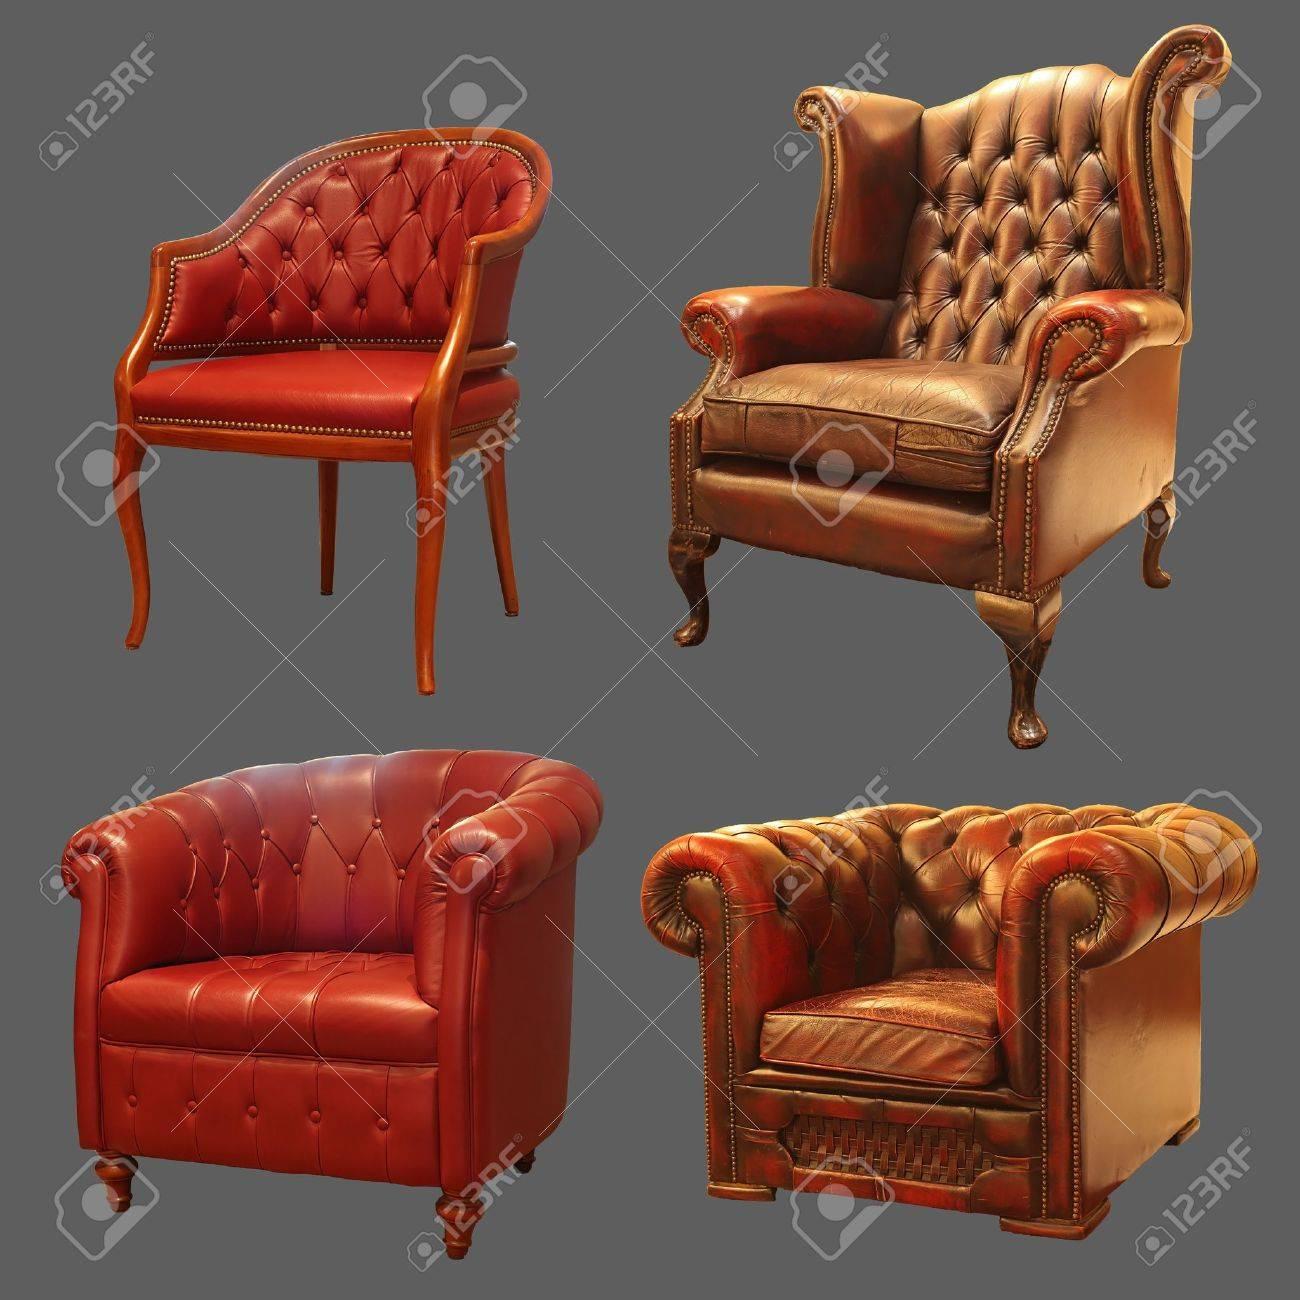 4 Ancient Armchair Stock Photo - 14167591